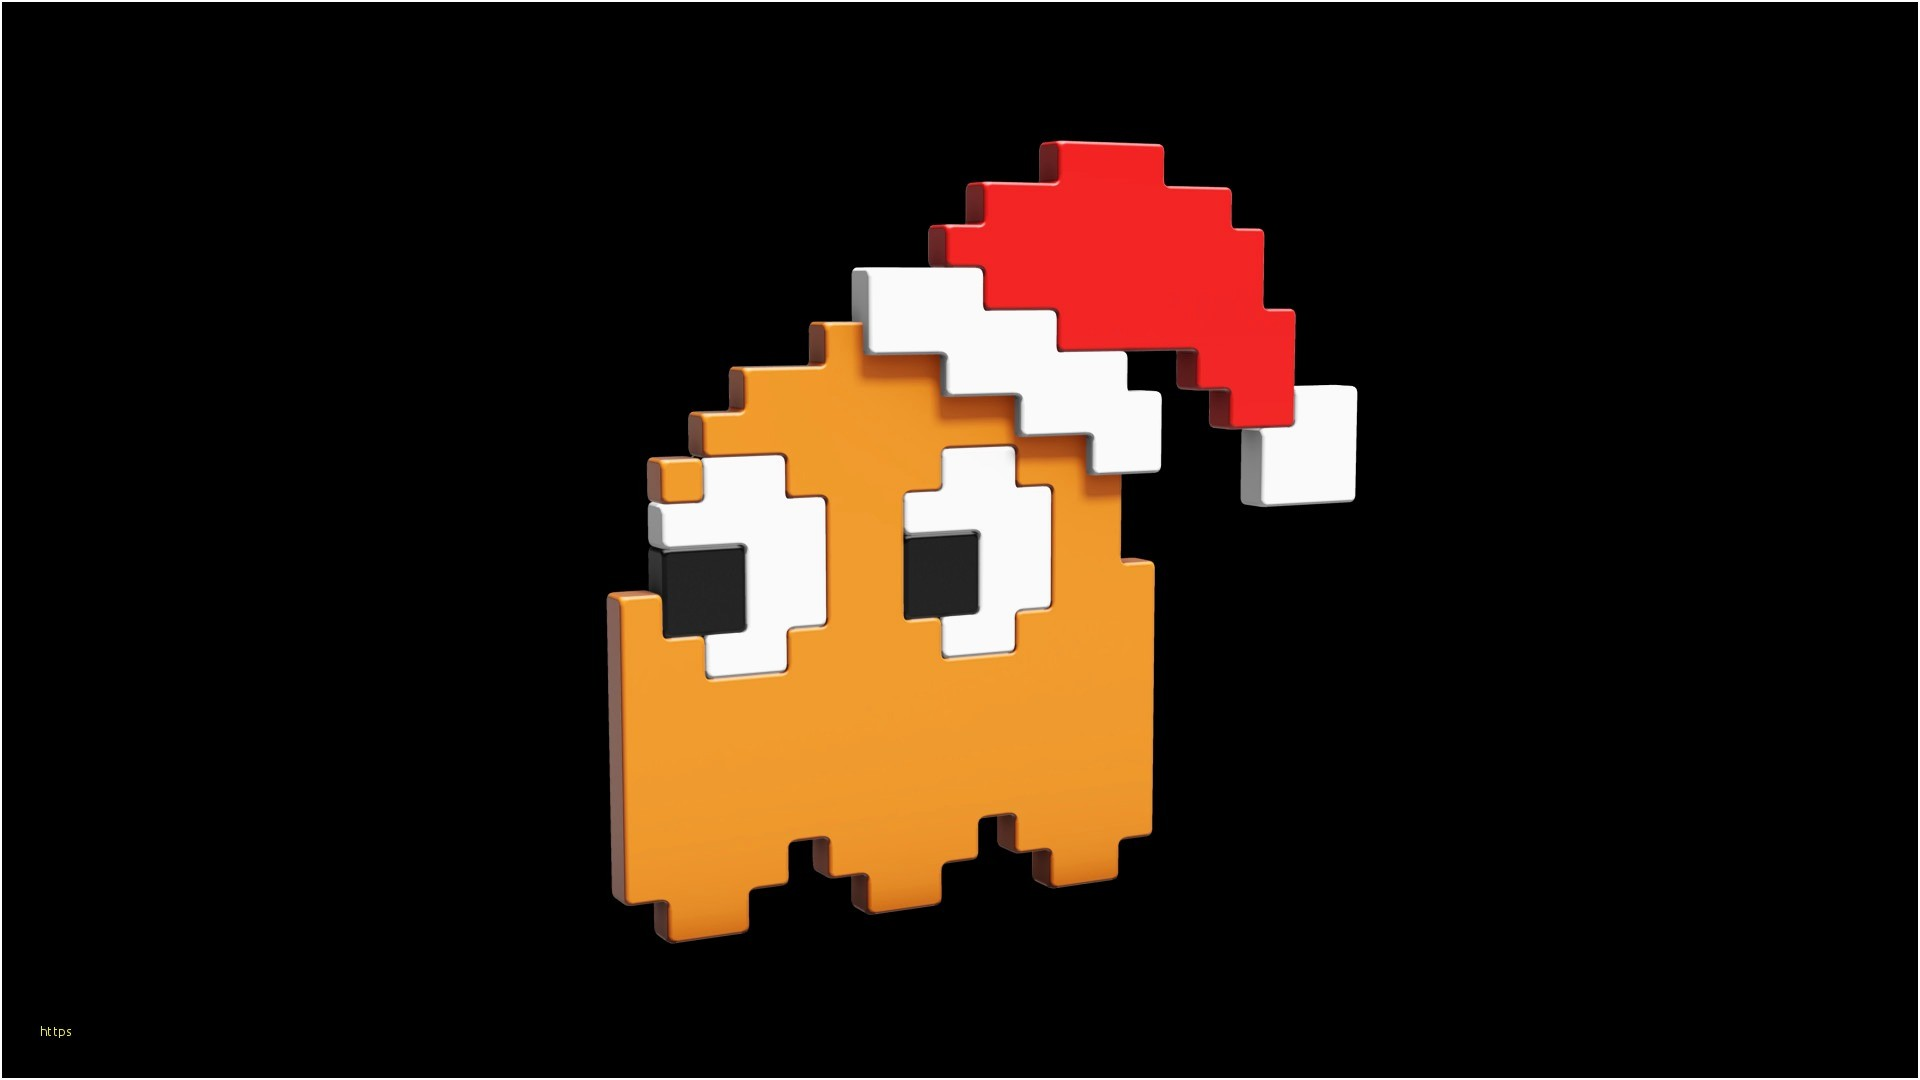 Res: 1920x1080, Pacman Wallpaper Lovely orange Pacman Wallpaper